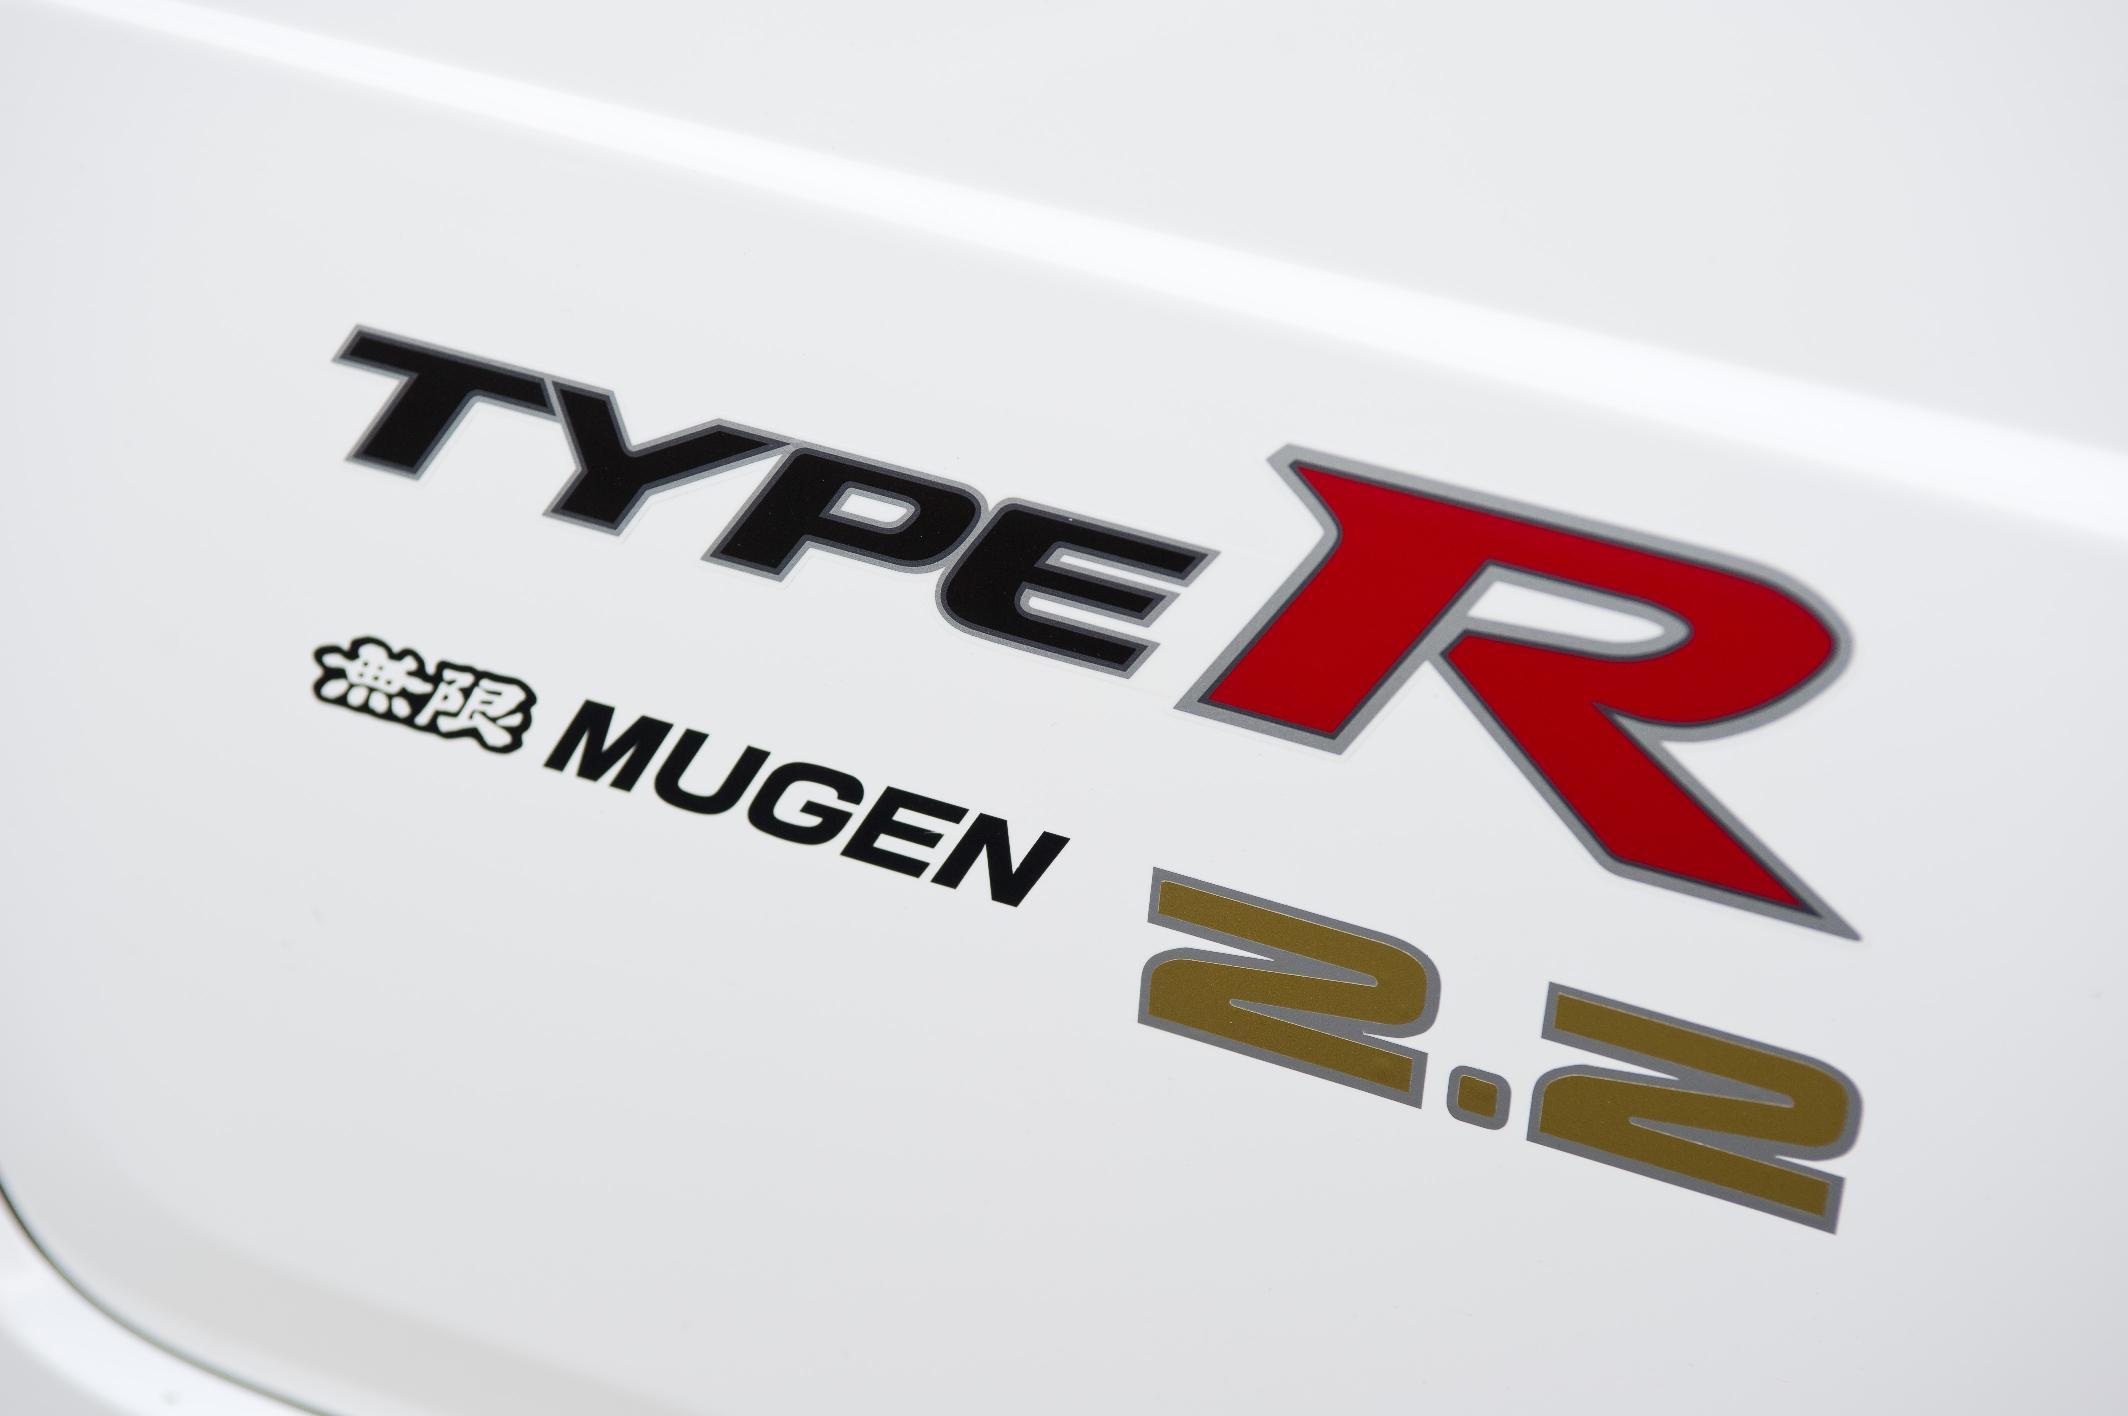 Honda Civic Type R Mugen 2.2 4